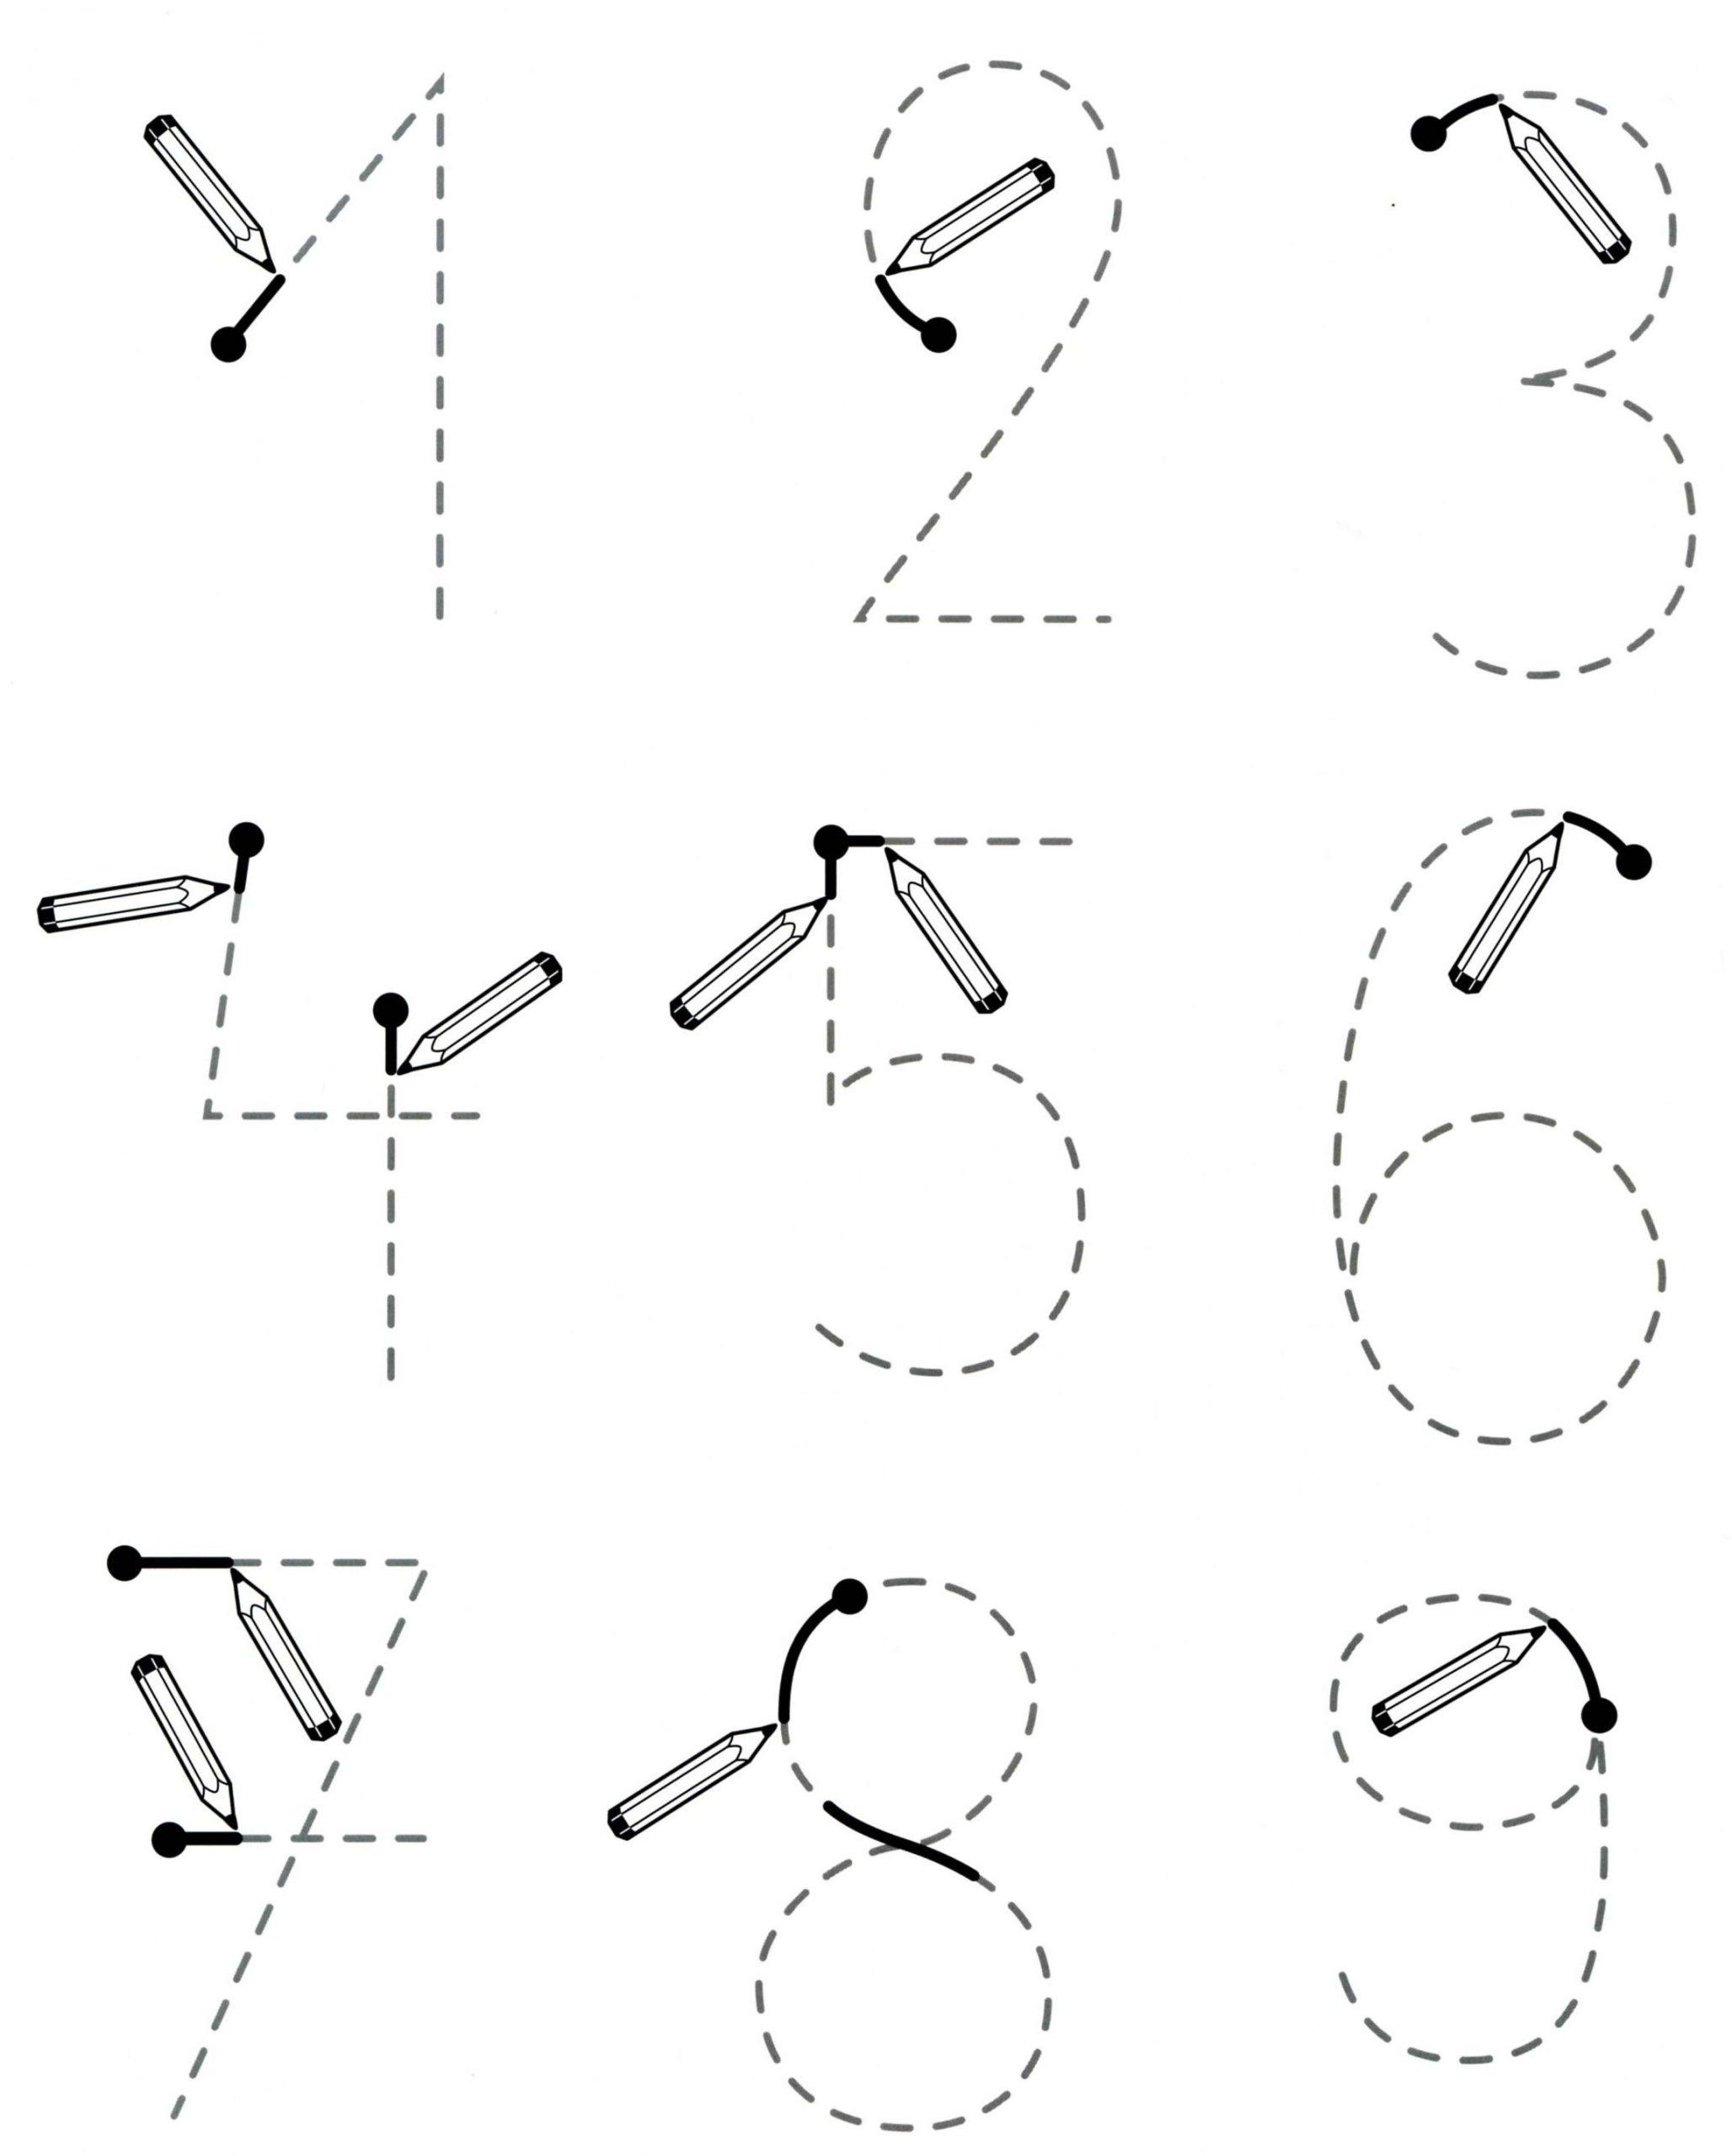 Ekladata Vcr-Esomcwelj42Pgqxacvxn4De | Actividades concernant Graphisme Les Vagues Moyenne Section